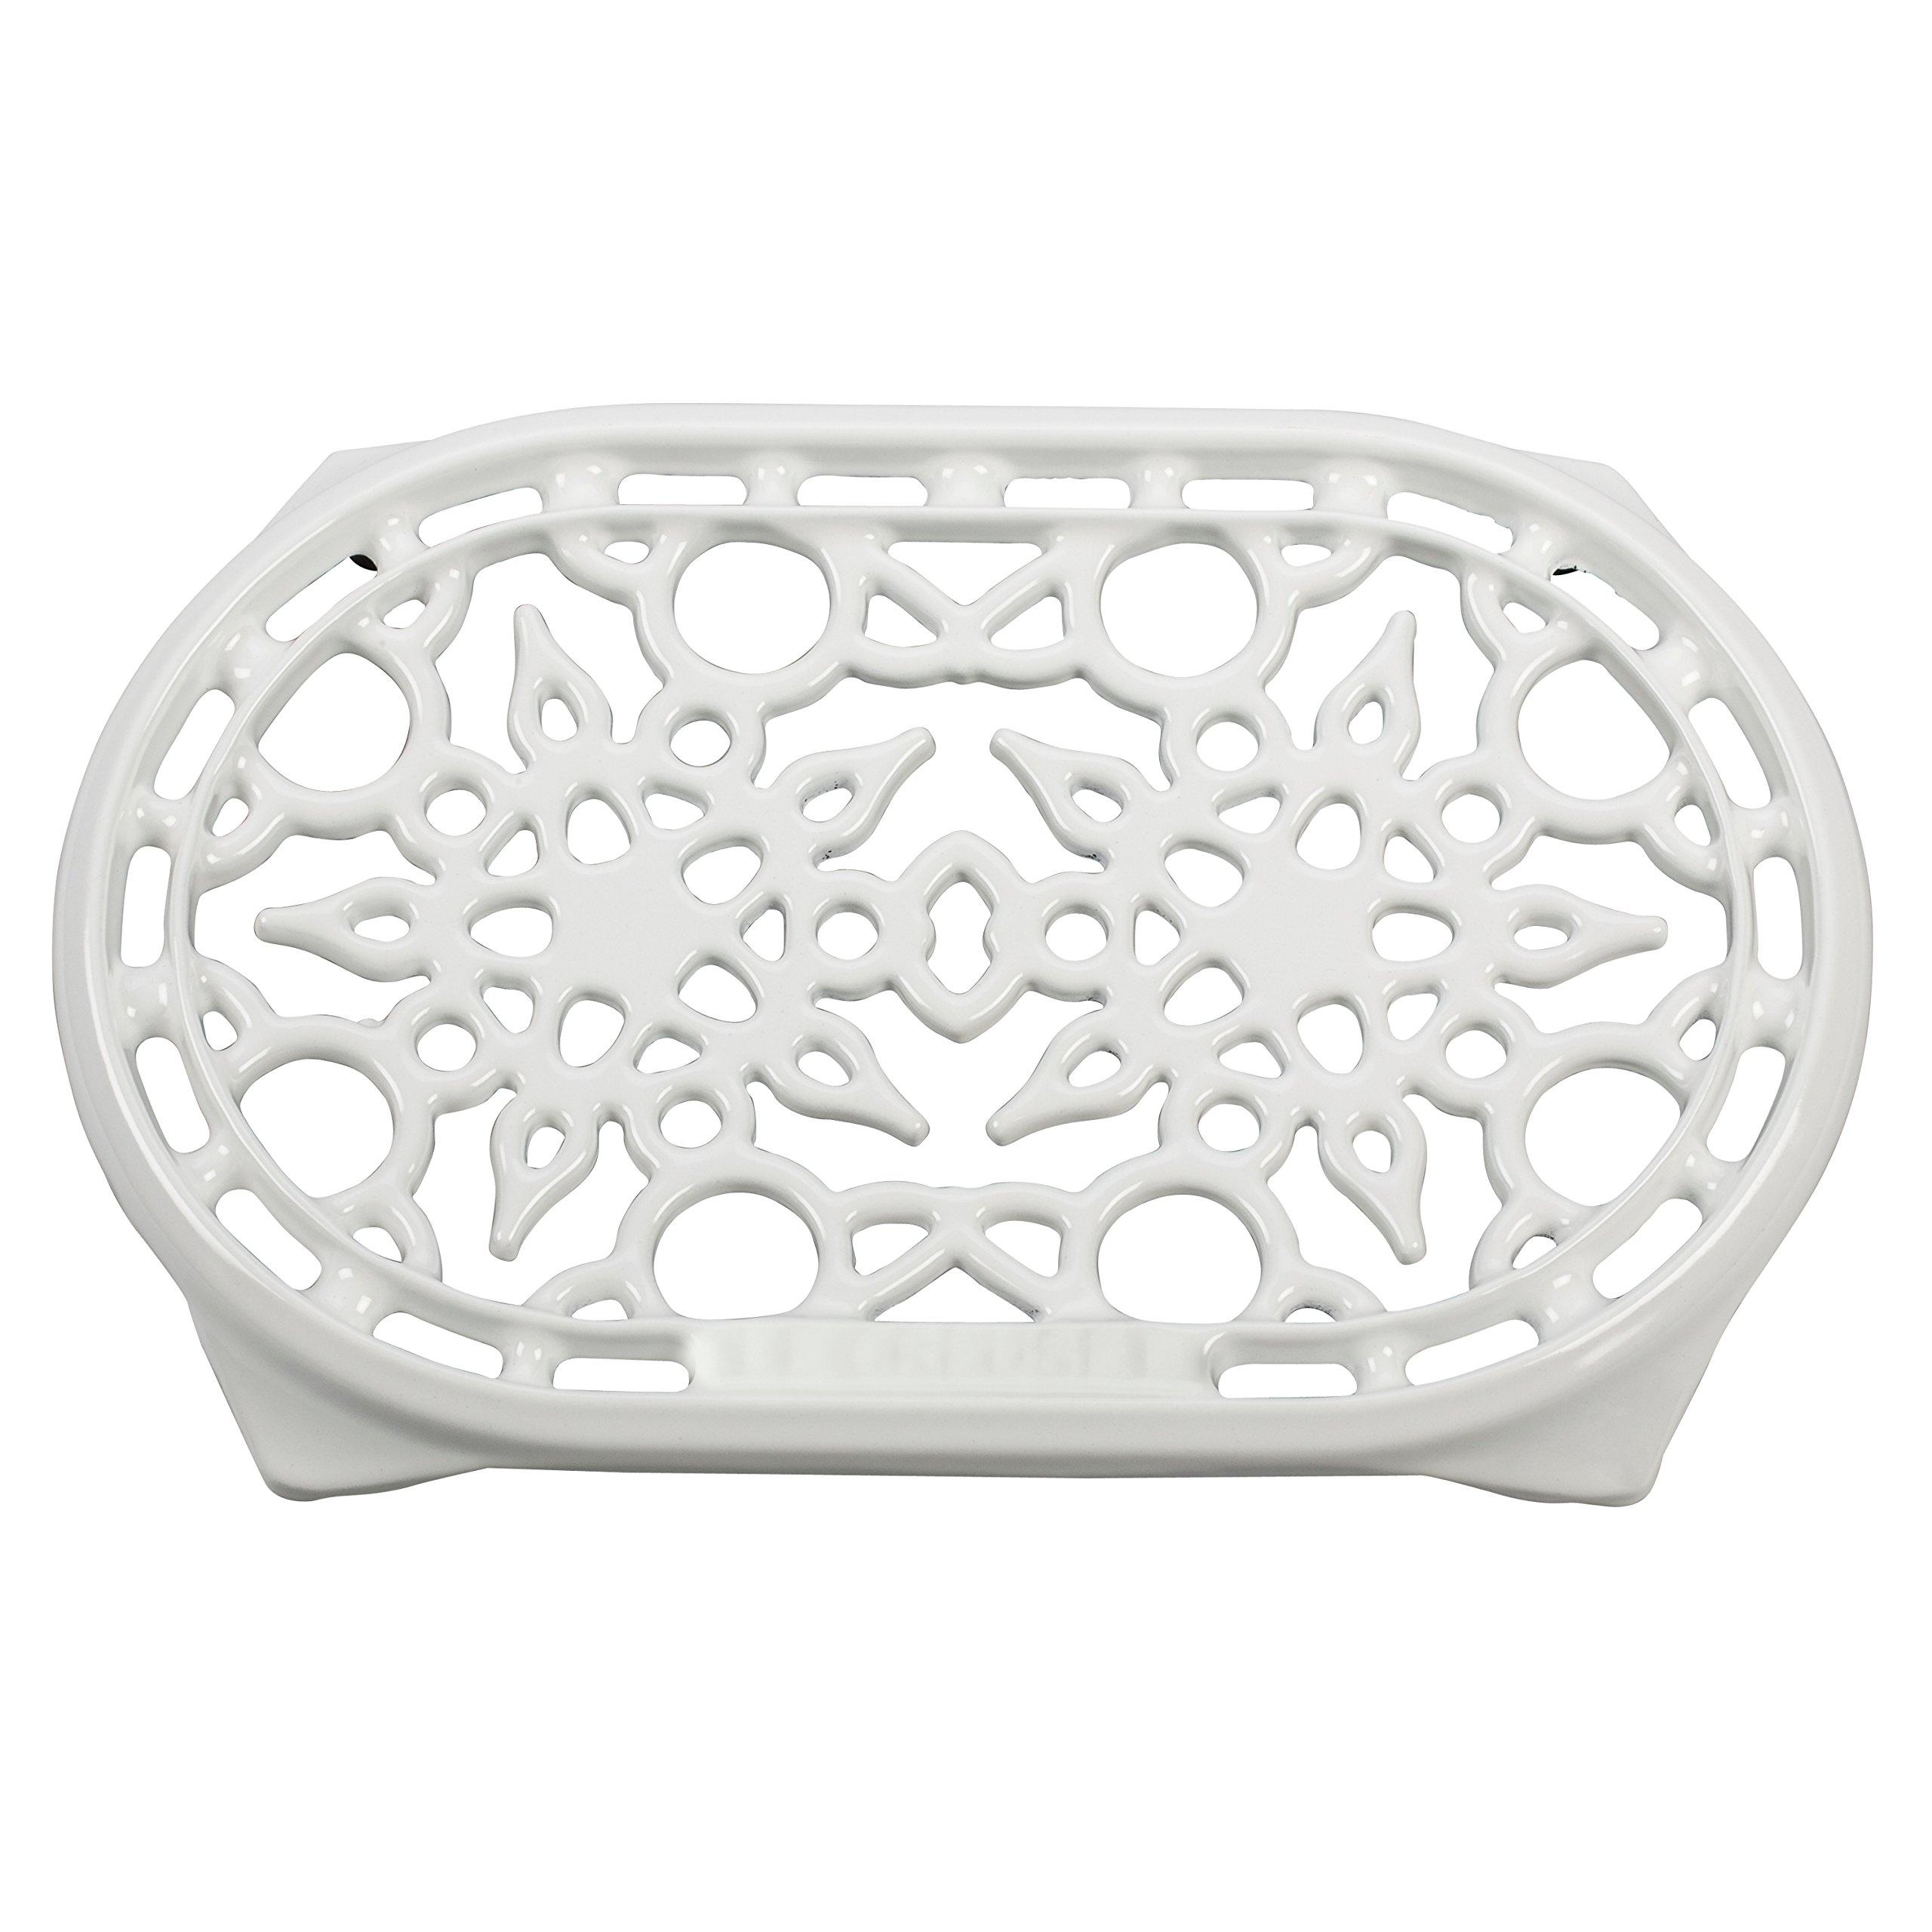 Le Creuset White Enameled Cast Iron 10.5 Inch Oval Trivet by Le Creuset (Image #1)